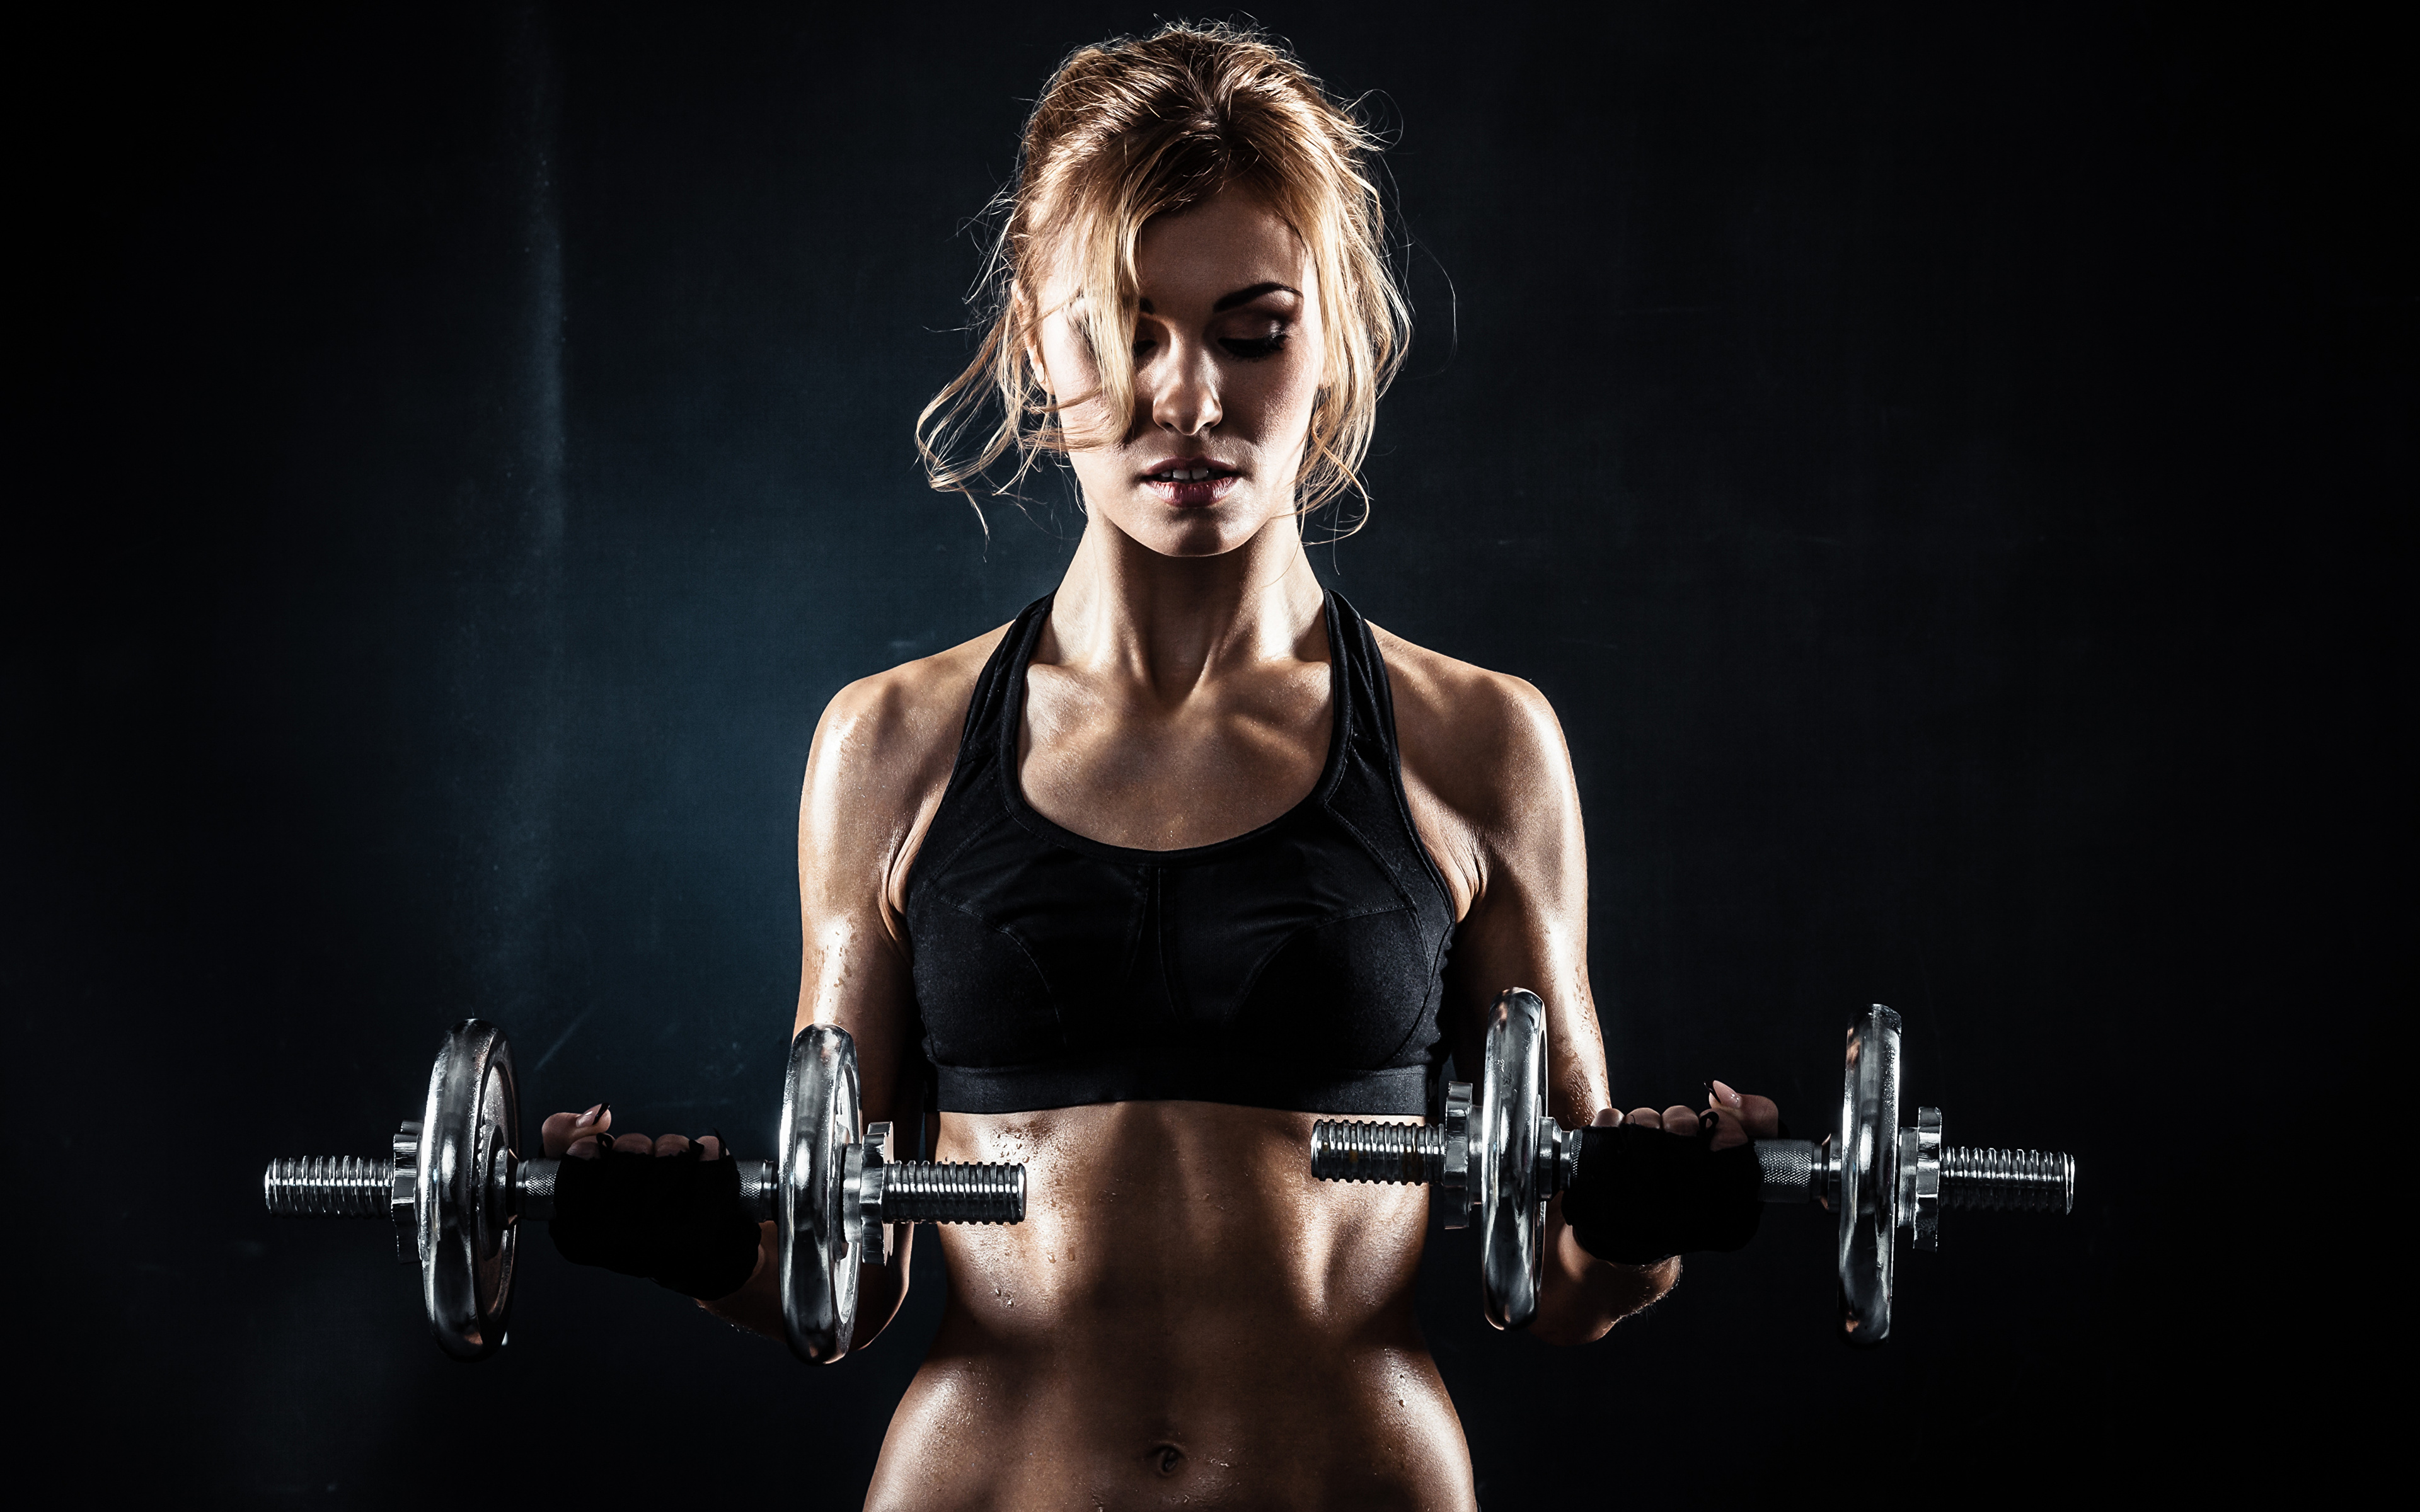 3840x2400 Fitness sexy pose blonde dumbbell Mancuerna mujer joven, mujeres jóvenes, deportivas, atlética, deportes, mancuernas Deporte Chicas